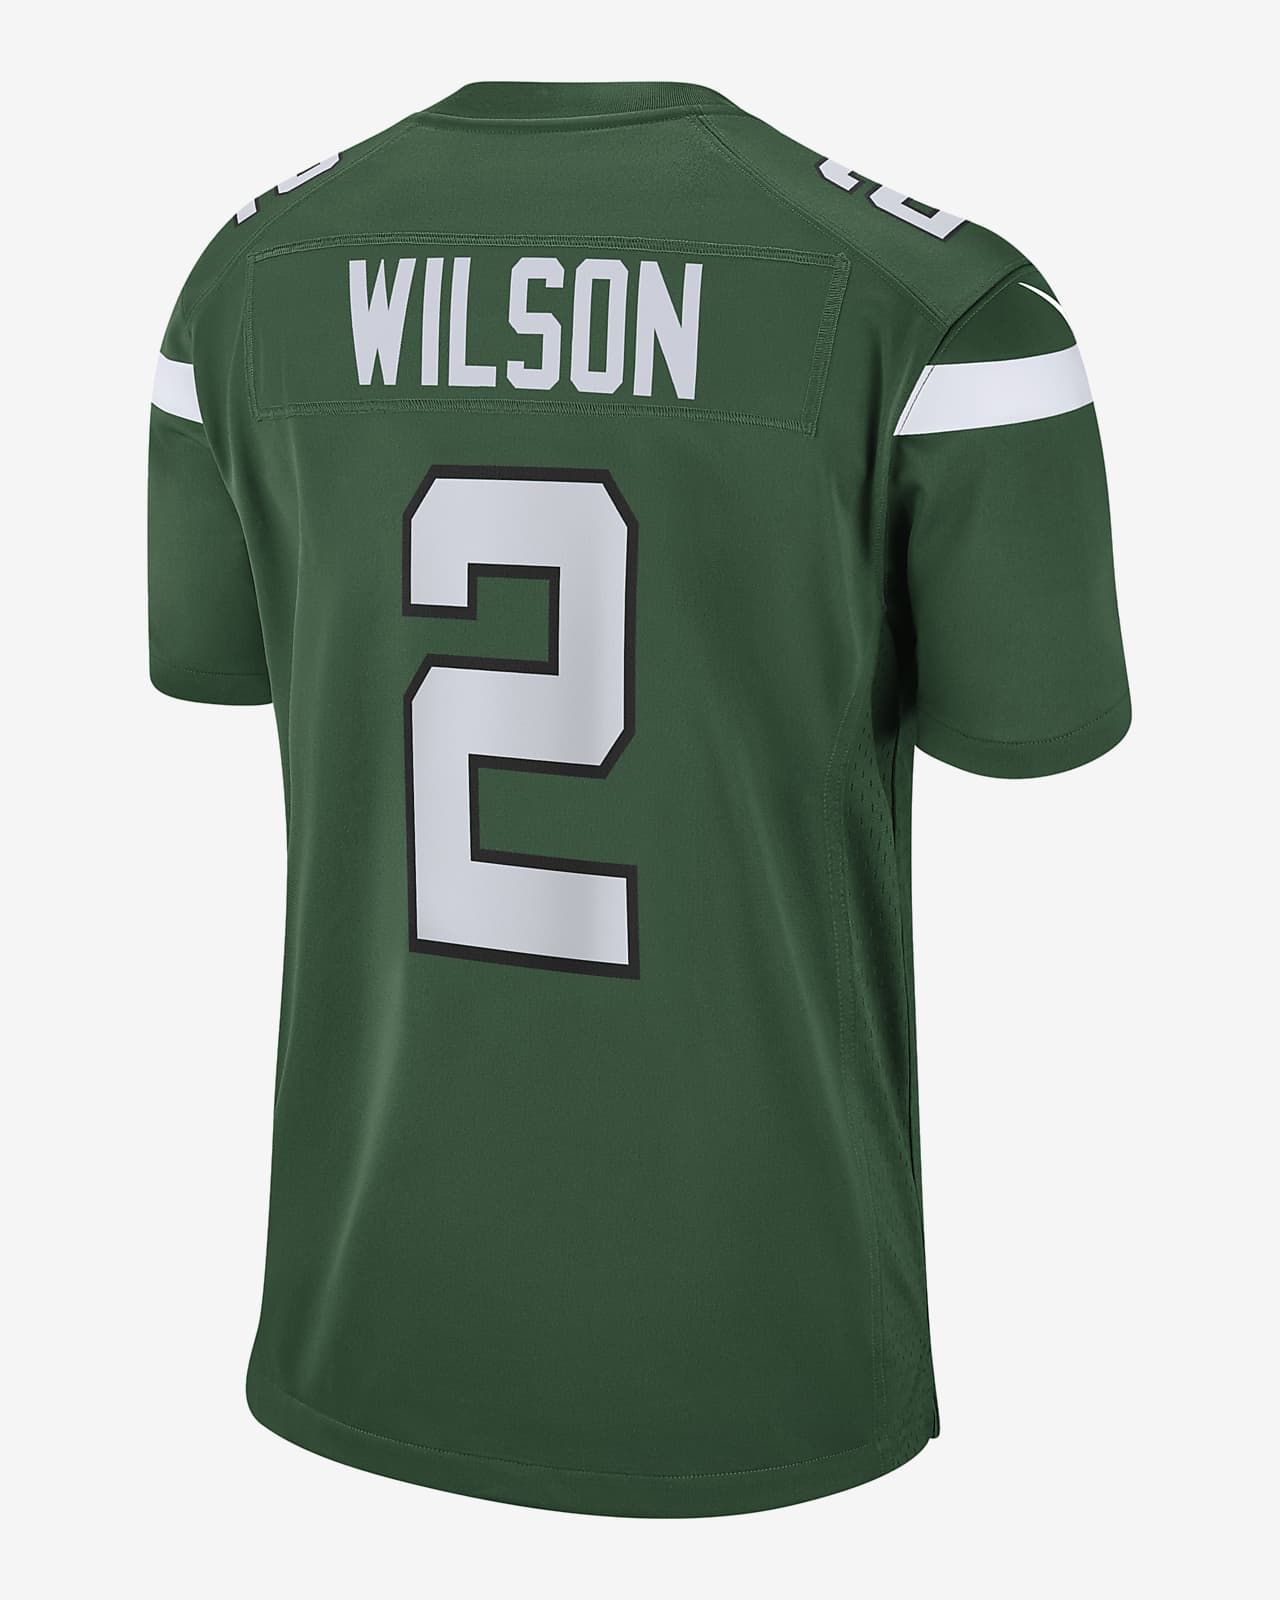 NFL New York Jets (Zach Wilson) Men's Game Football Jersey